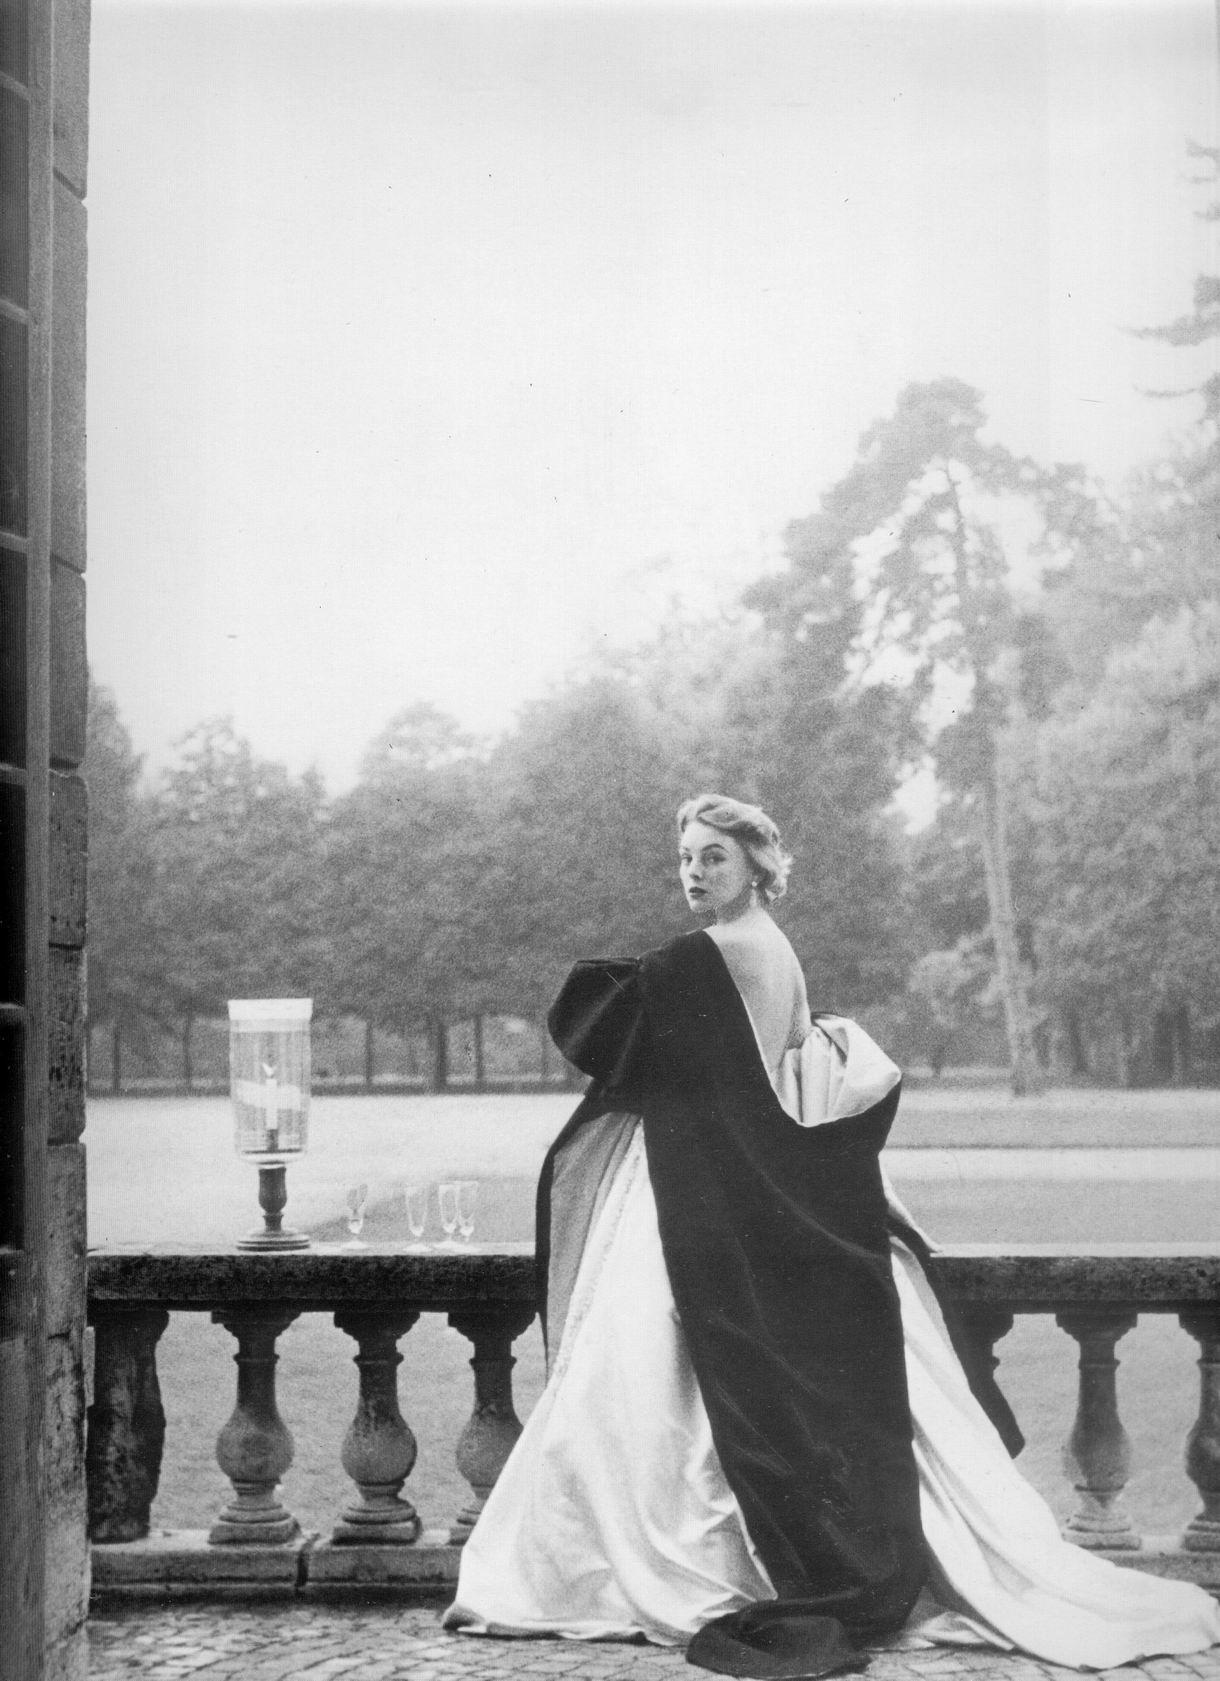 Margaret Philips pentru Givenchy, fotografiata de Henry Clarke in 1952